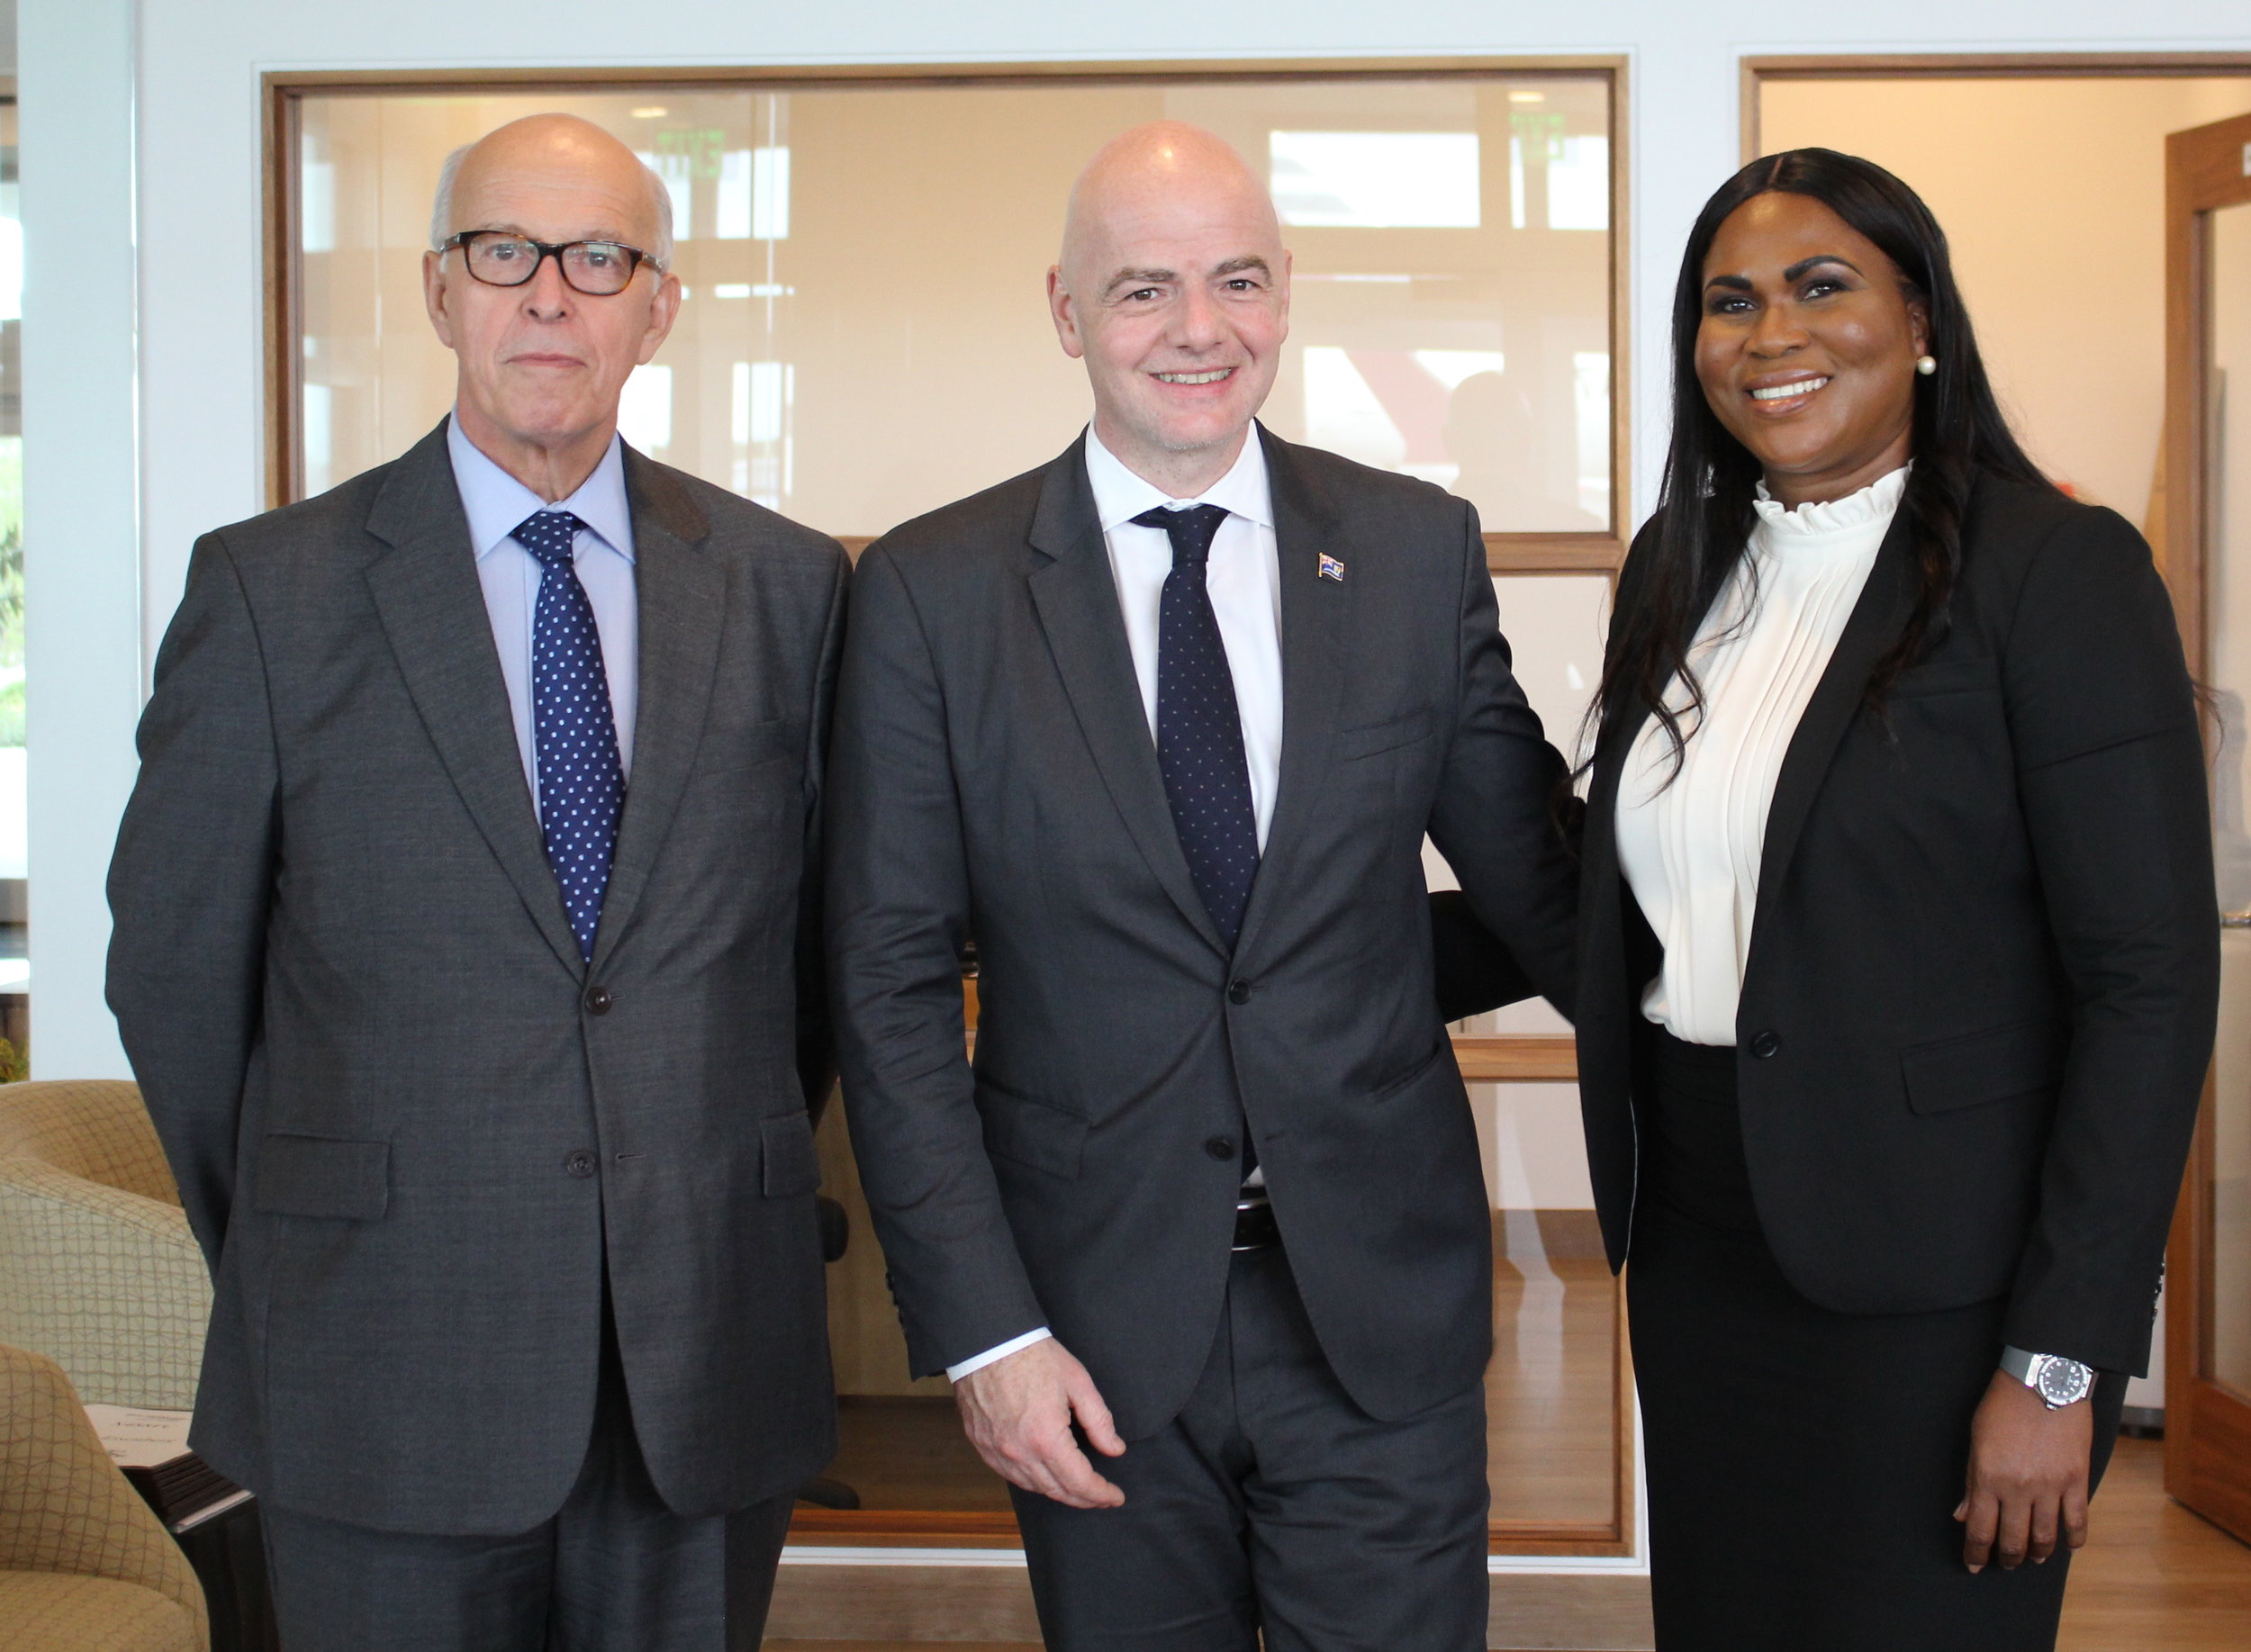 His Excellency Dr. John Freeman, FIFA President Gianni Infantino, TCIFA President Sonia Bien-Aime